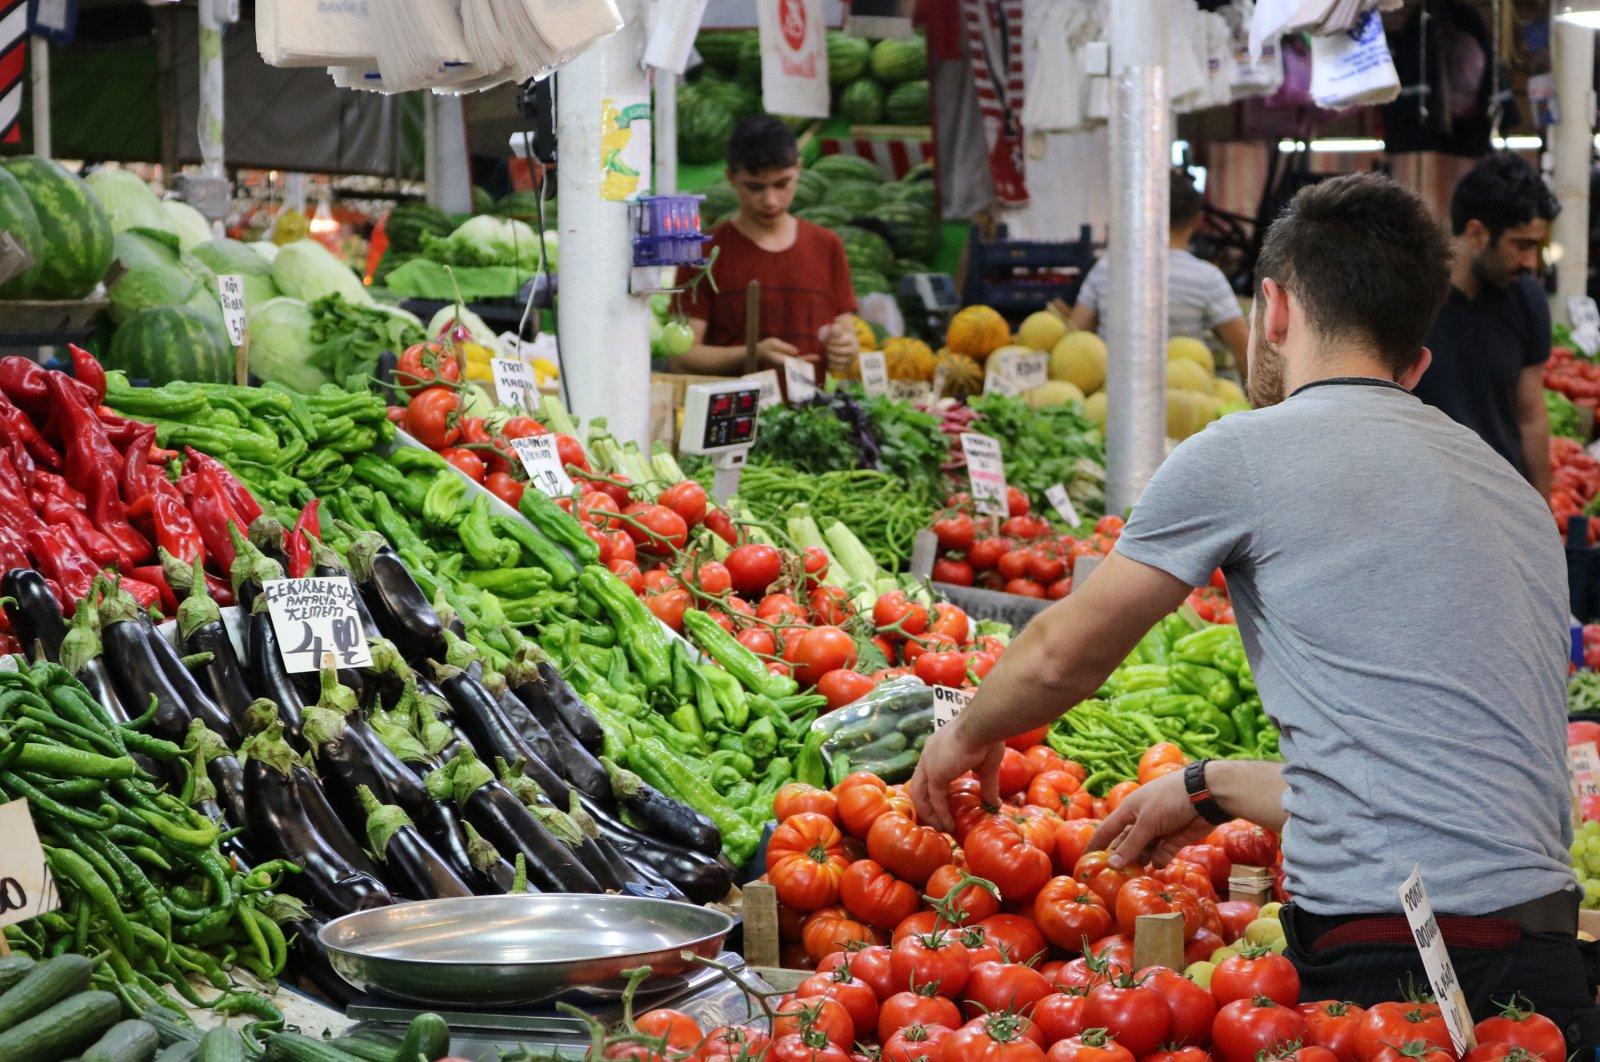 A seller arranges his produce at a bazaar in Turkey's Sivas, July 4, 2019. (Shutterstock Photo)